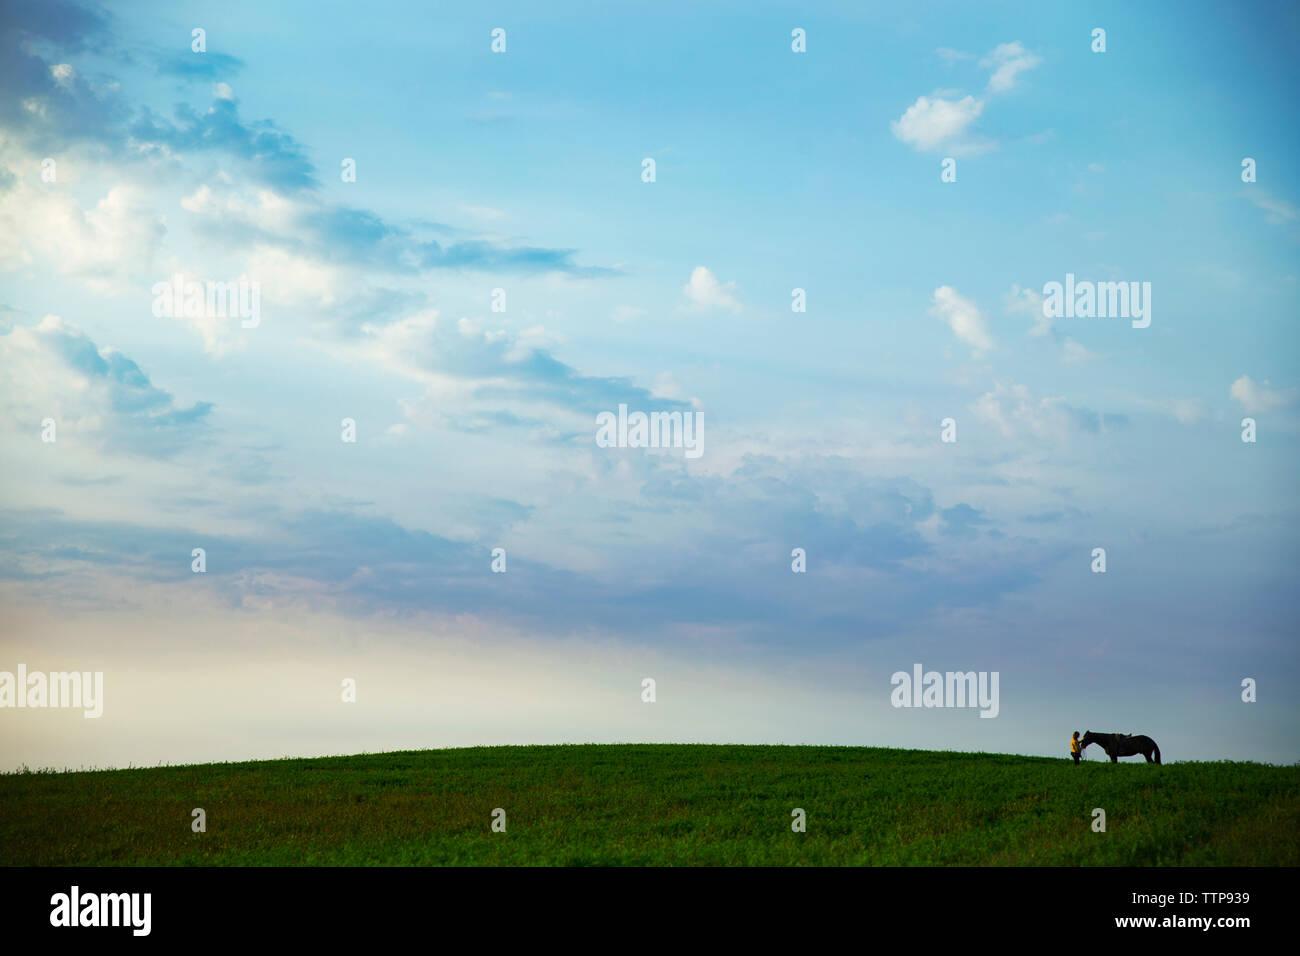 Vista lejana de Mujer de pie con caballo sobre césped Foto de stock